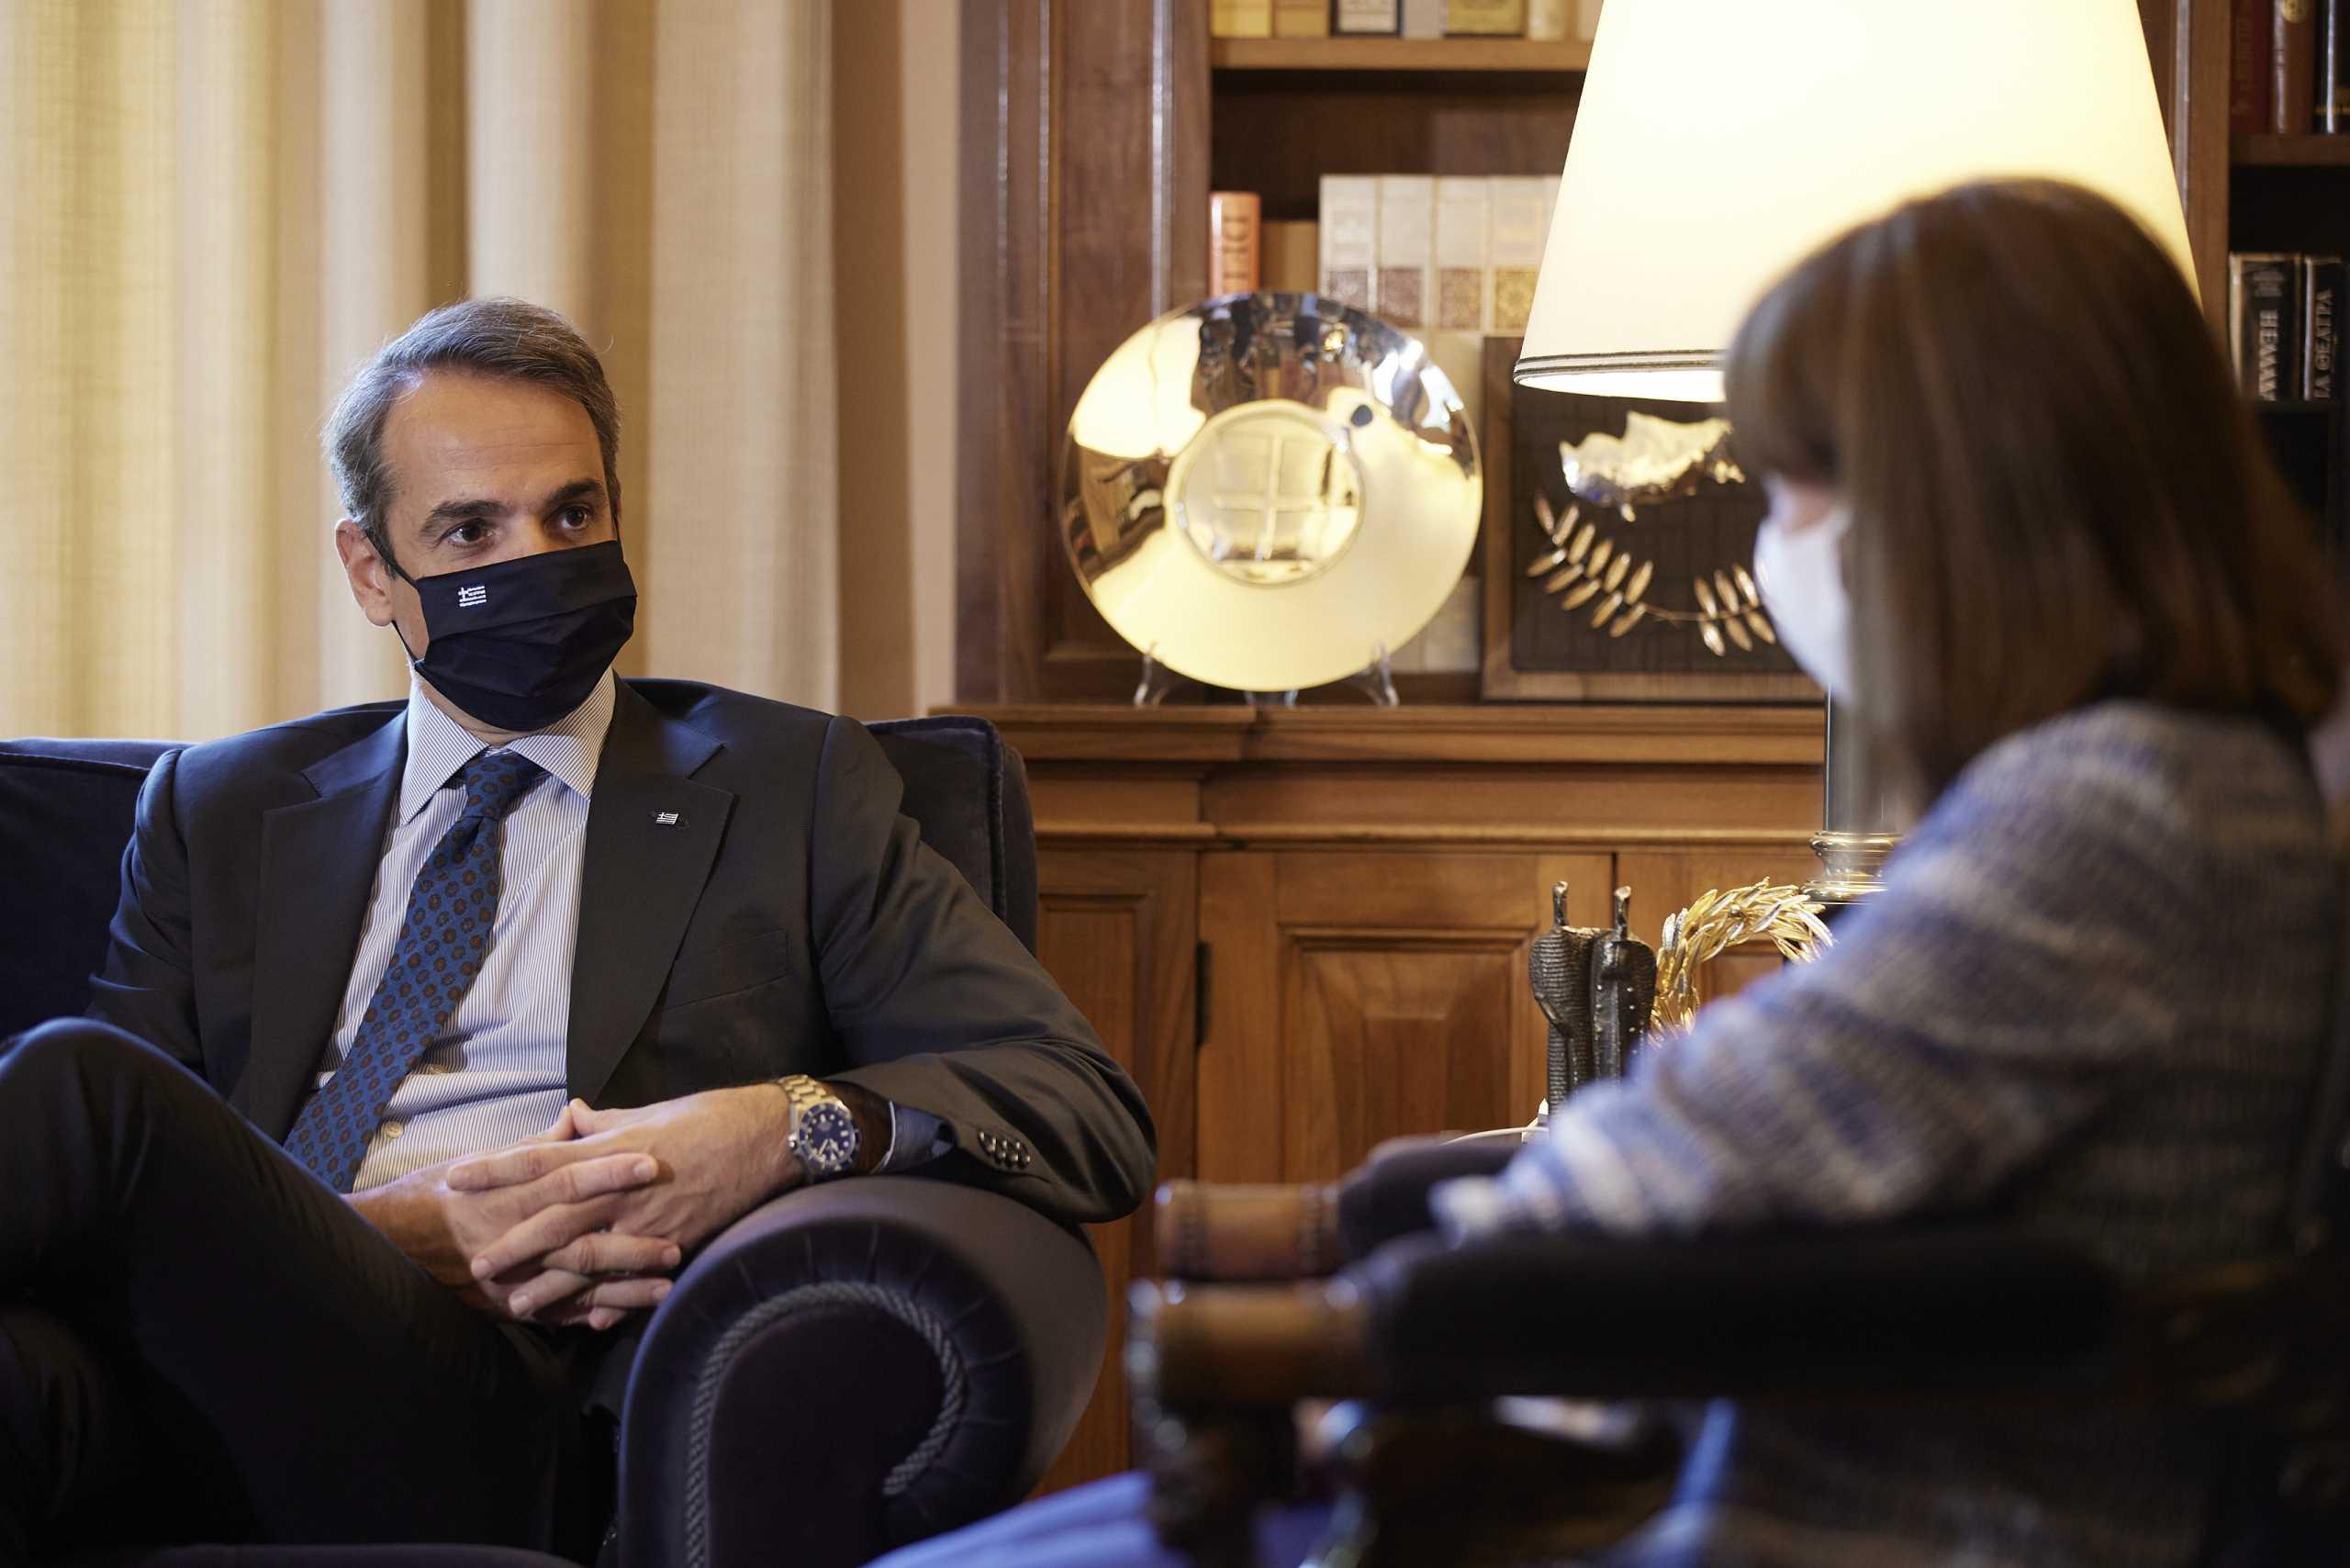 Belharra, Rafale και Γαλλία μονοπώλησαν τη συνάντηση Σακελλαροπούλου – Μητσοτάκη